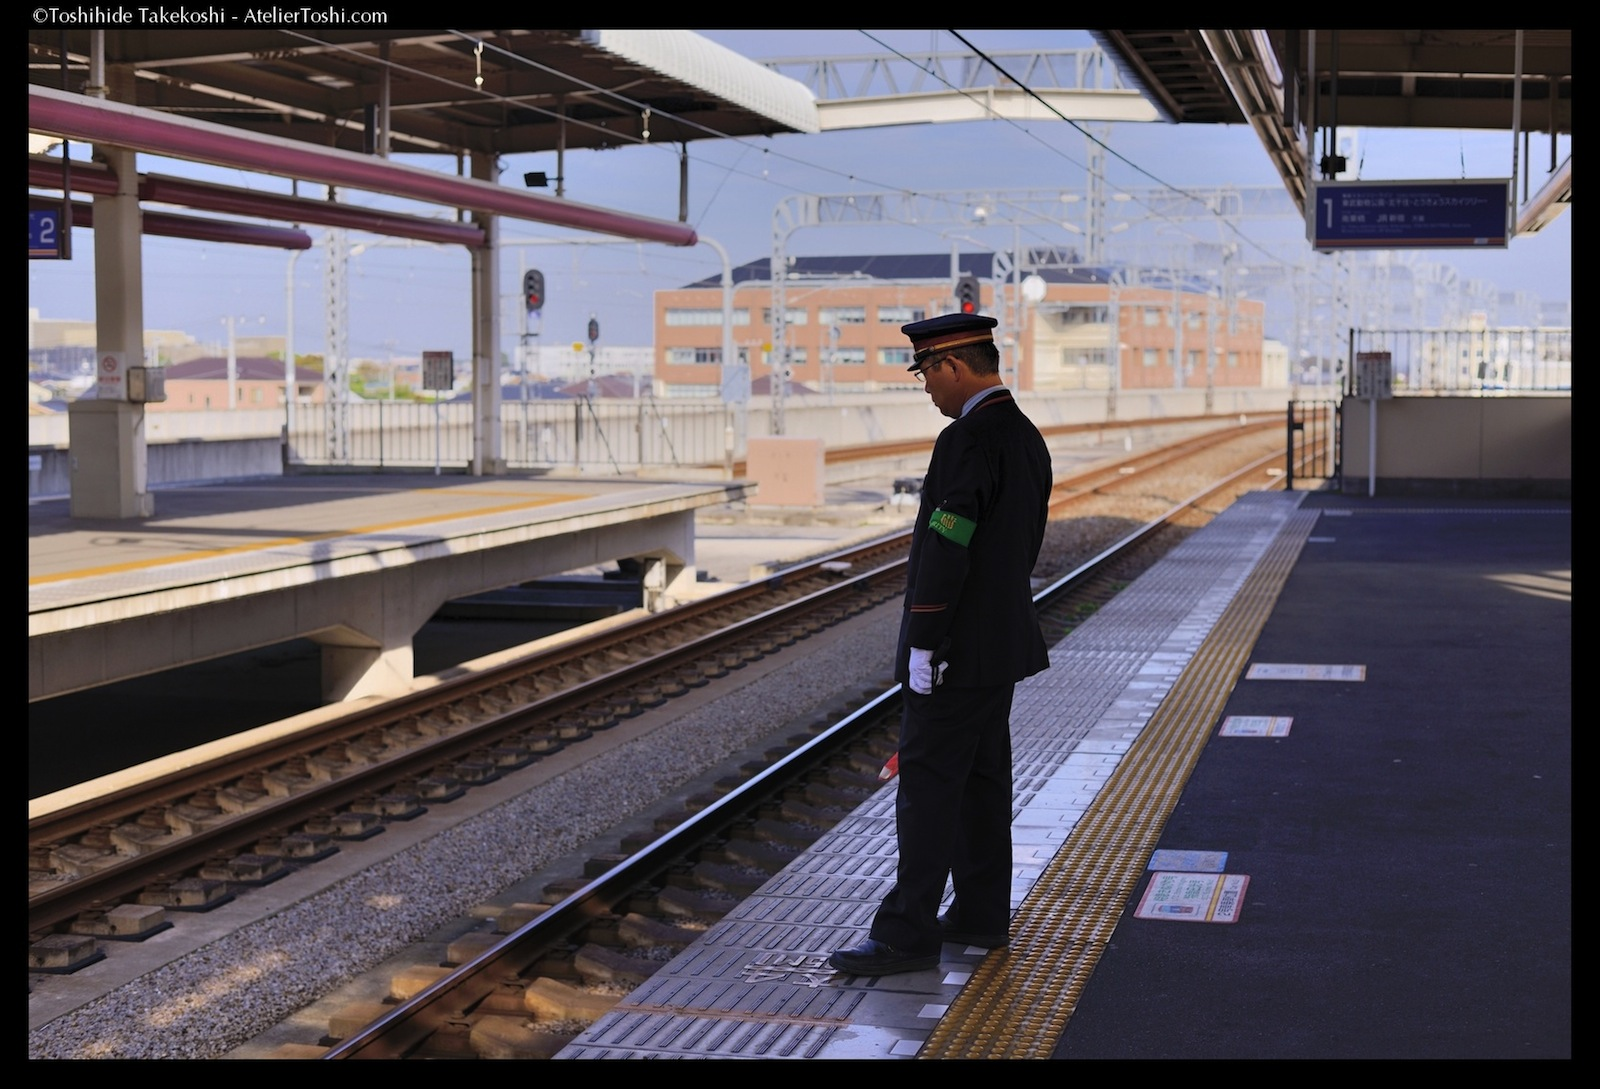 Photo By Toshihide Takekoshi